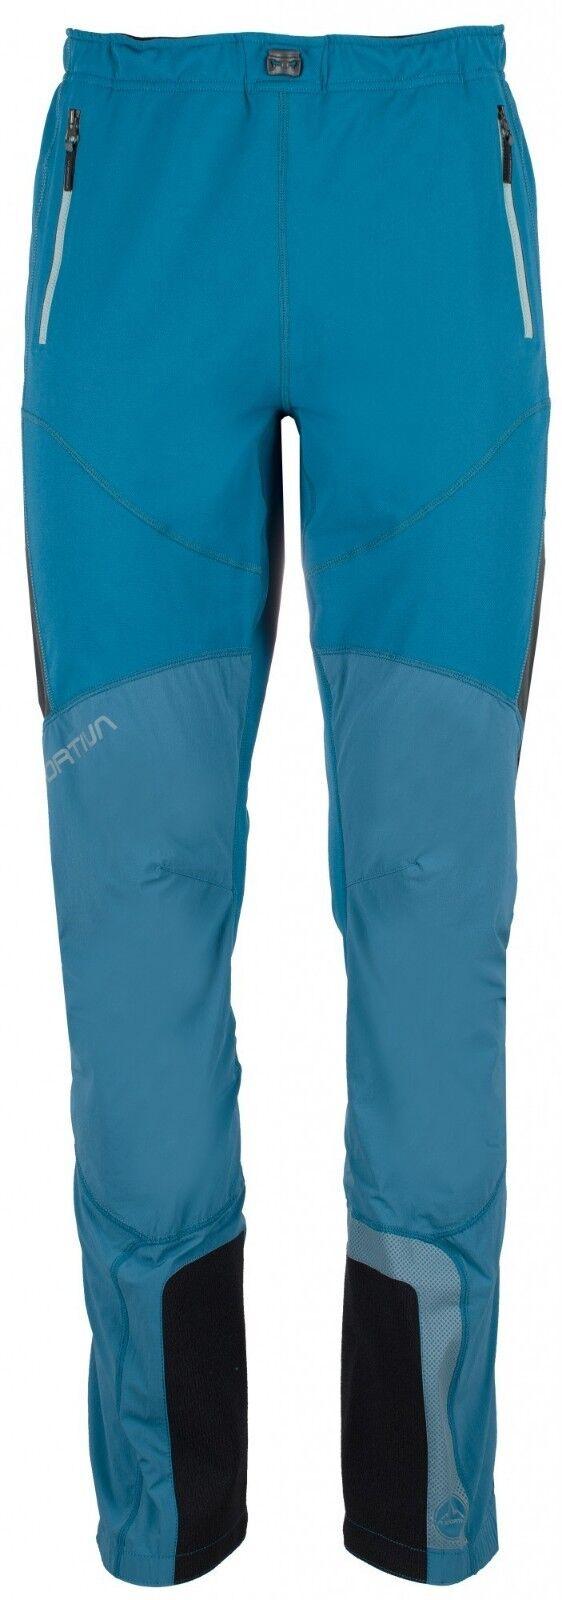 La Sportiva Solid Pantaloni (M) Lago